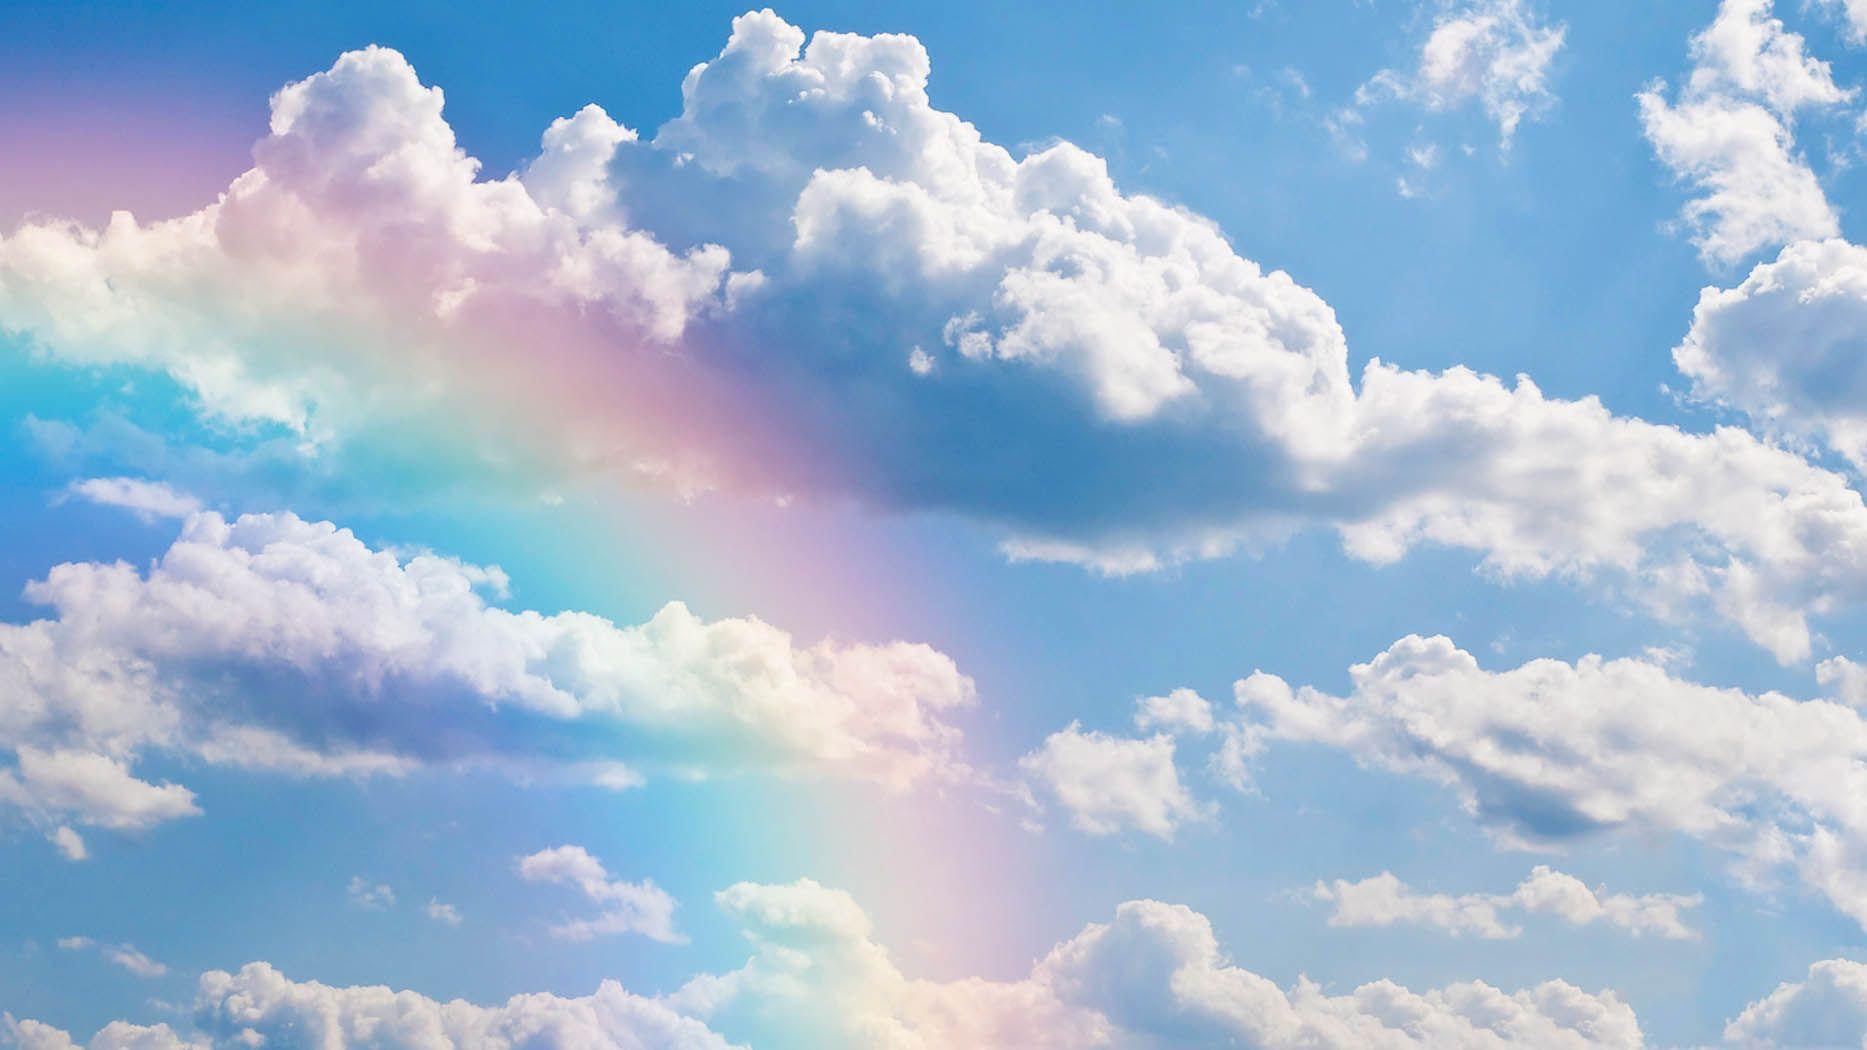 C u sky photoshop sky blue sky clouds cloud wallpaper sky hd - Hd clouds for photoshop ...